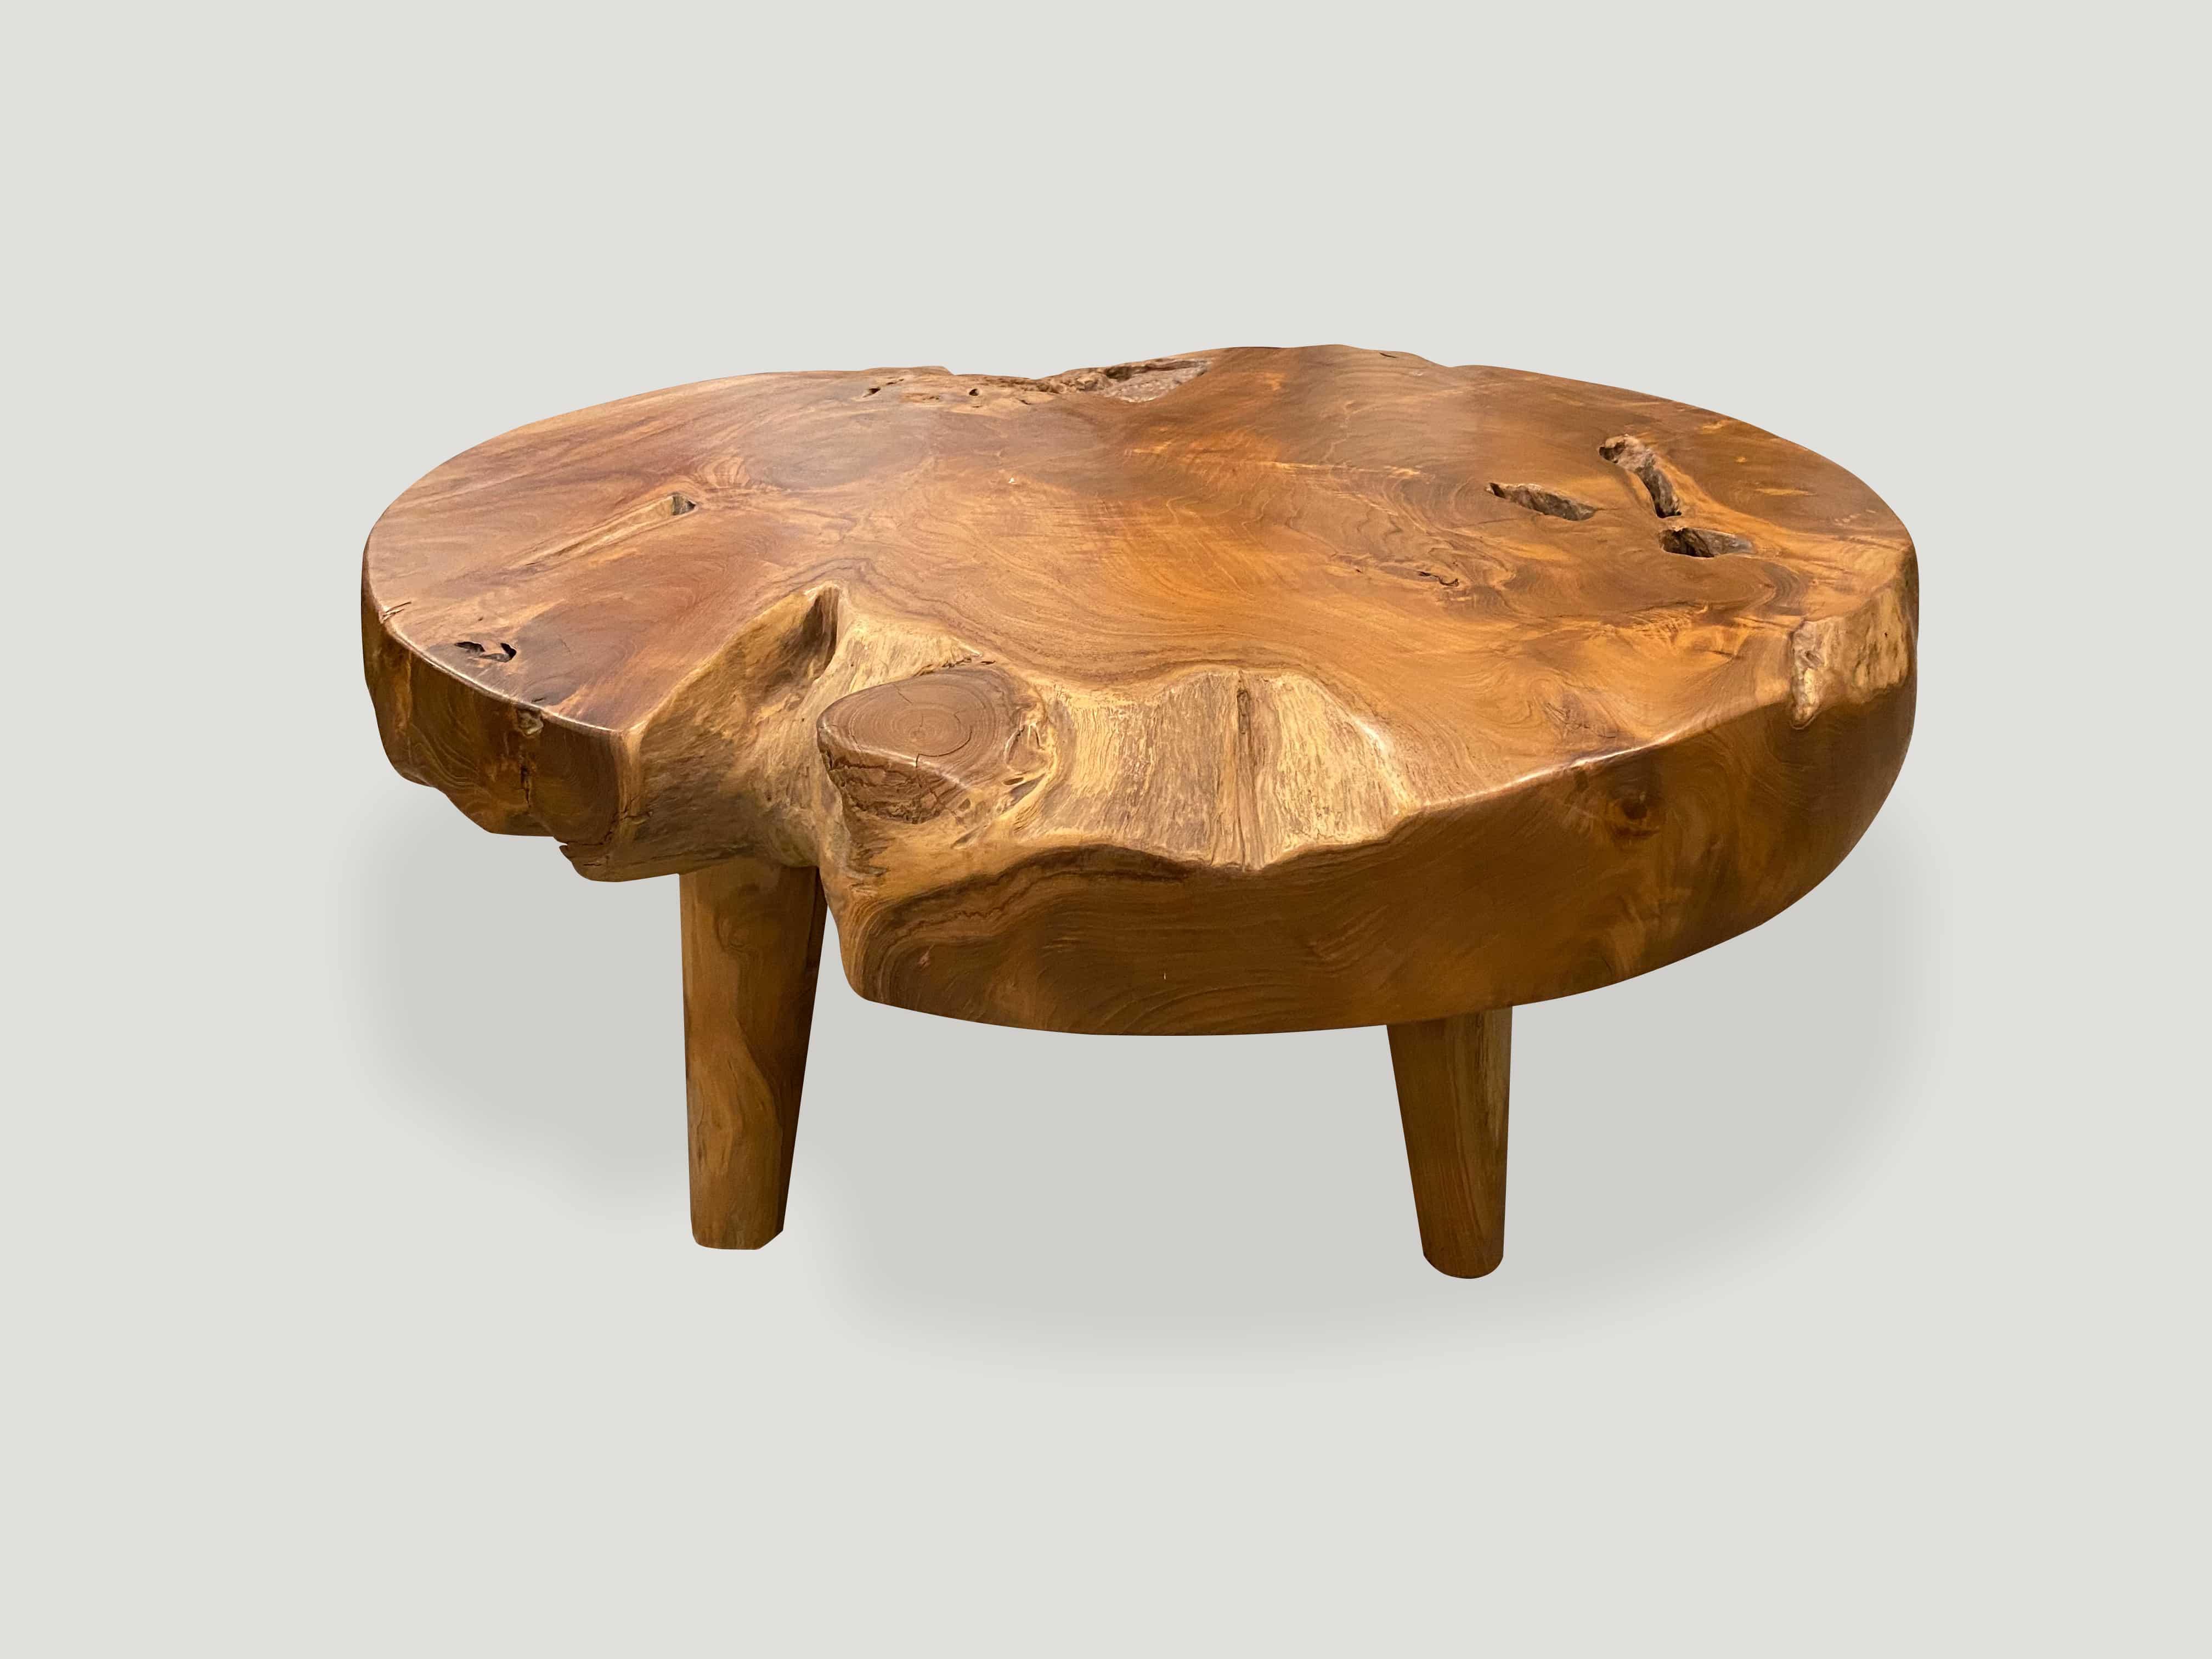 natural teak wood coffee table